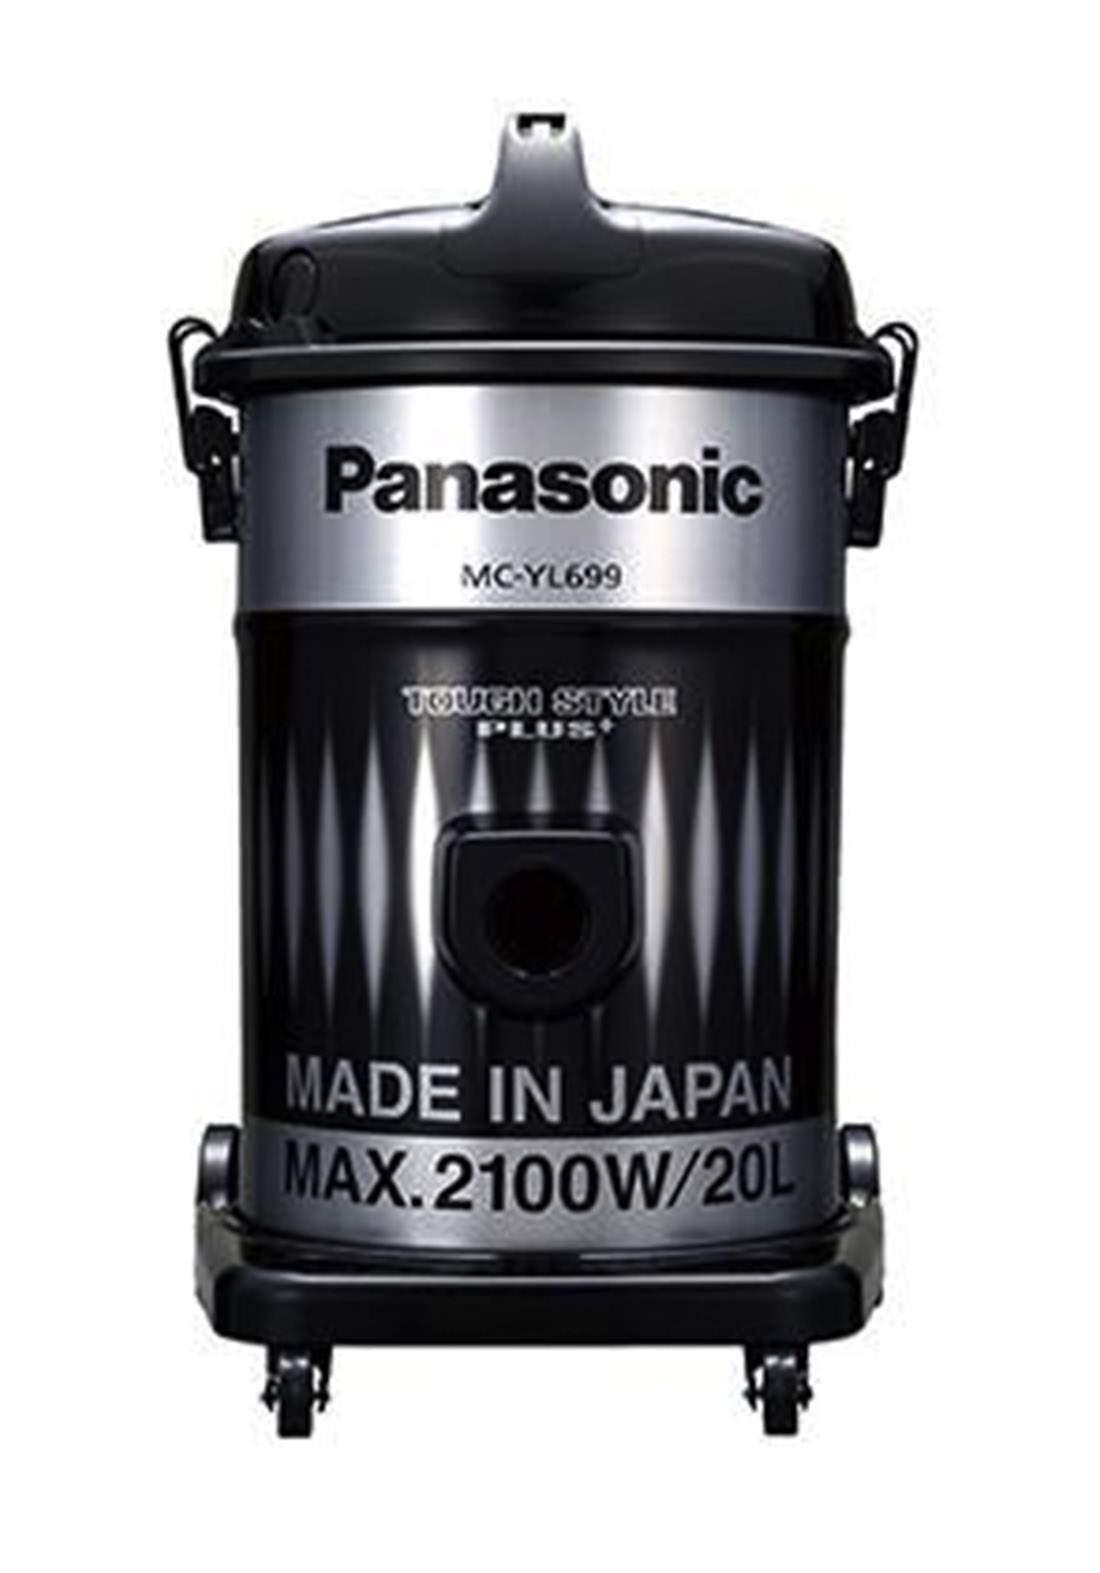 Panasonic (MC-YL699S149) 20 Liters 2100w Tank Vacum Cleaner مكنسة كهربائية